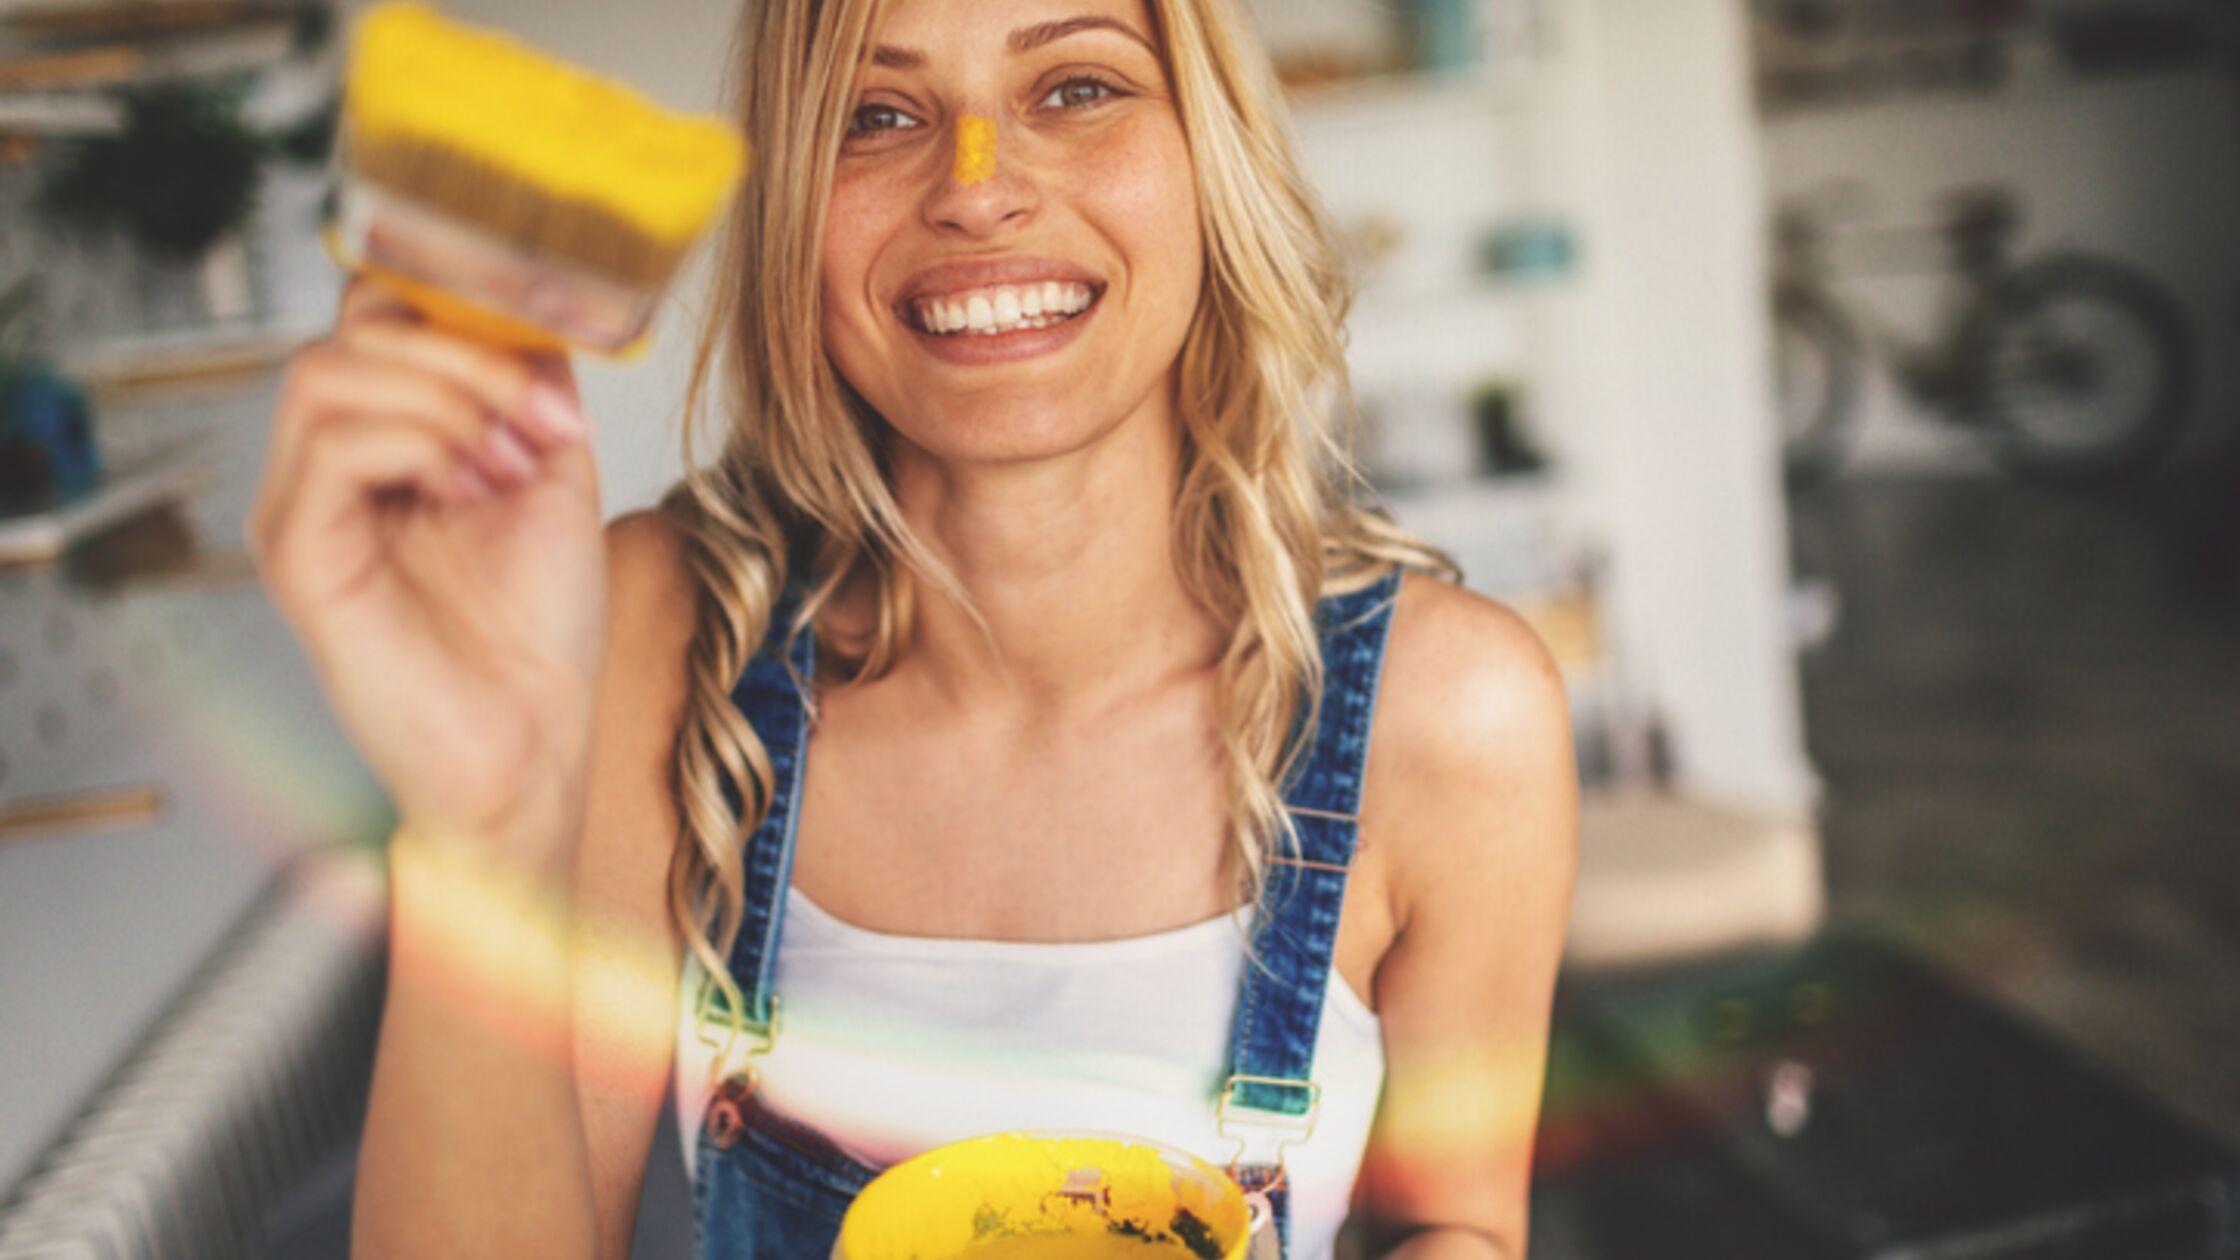 Tapetenwechsel: 5 Ideen für kreative Wandgestaltung